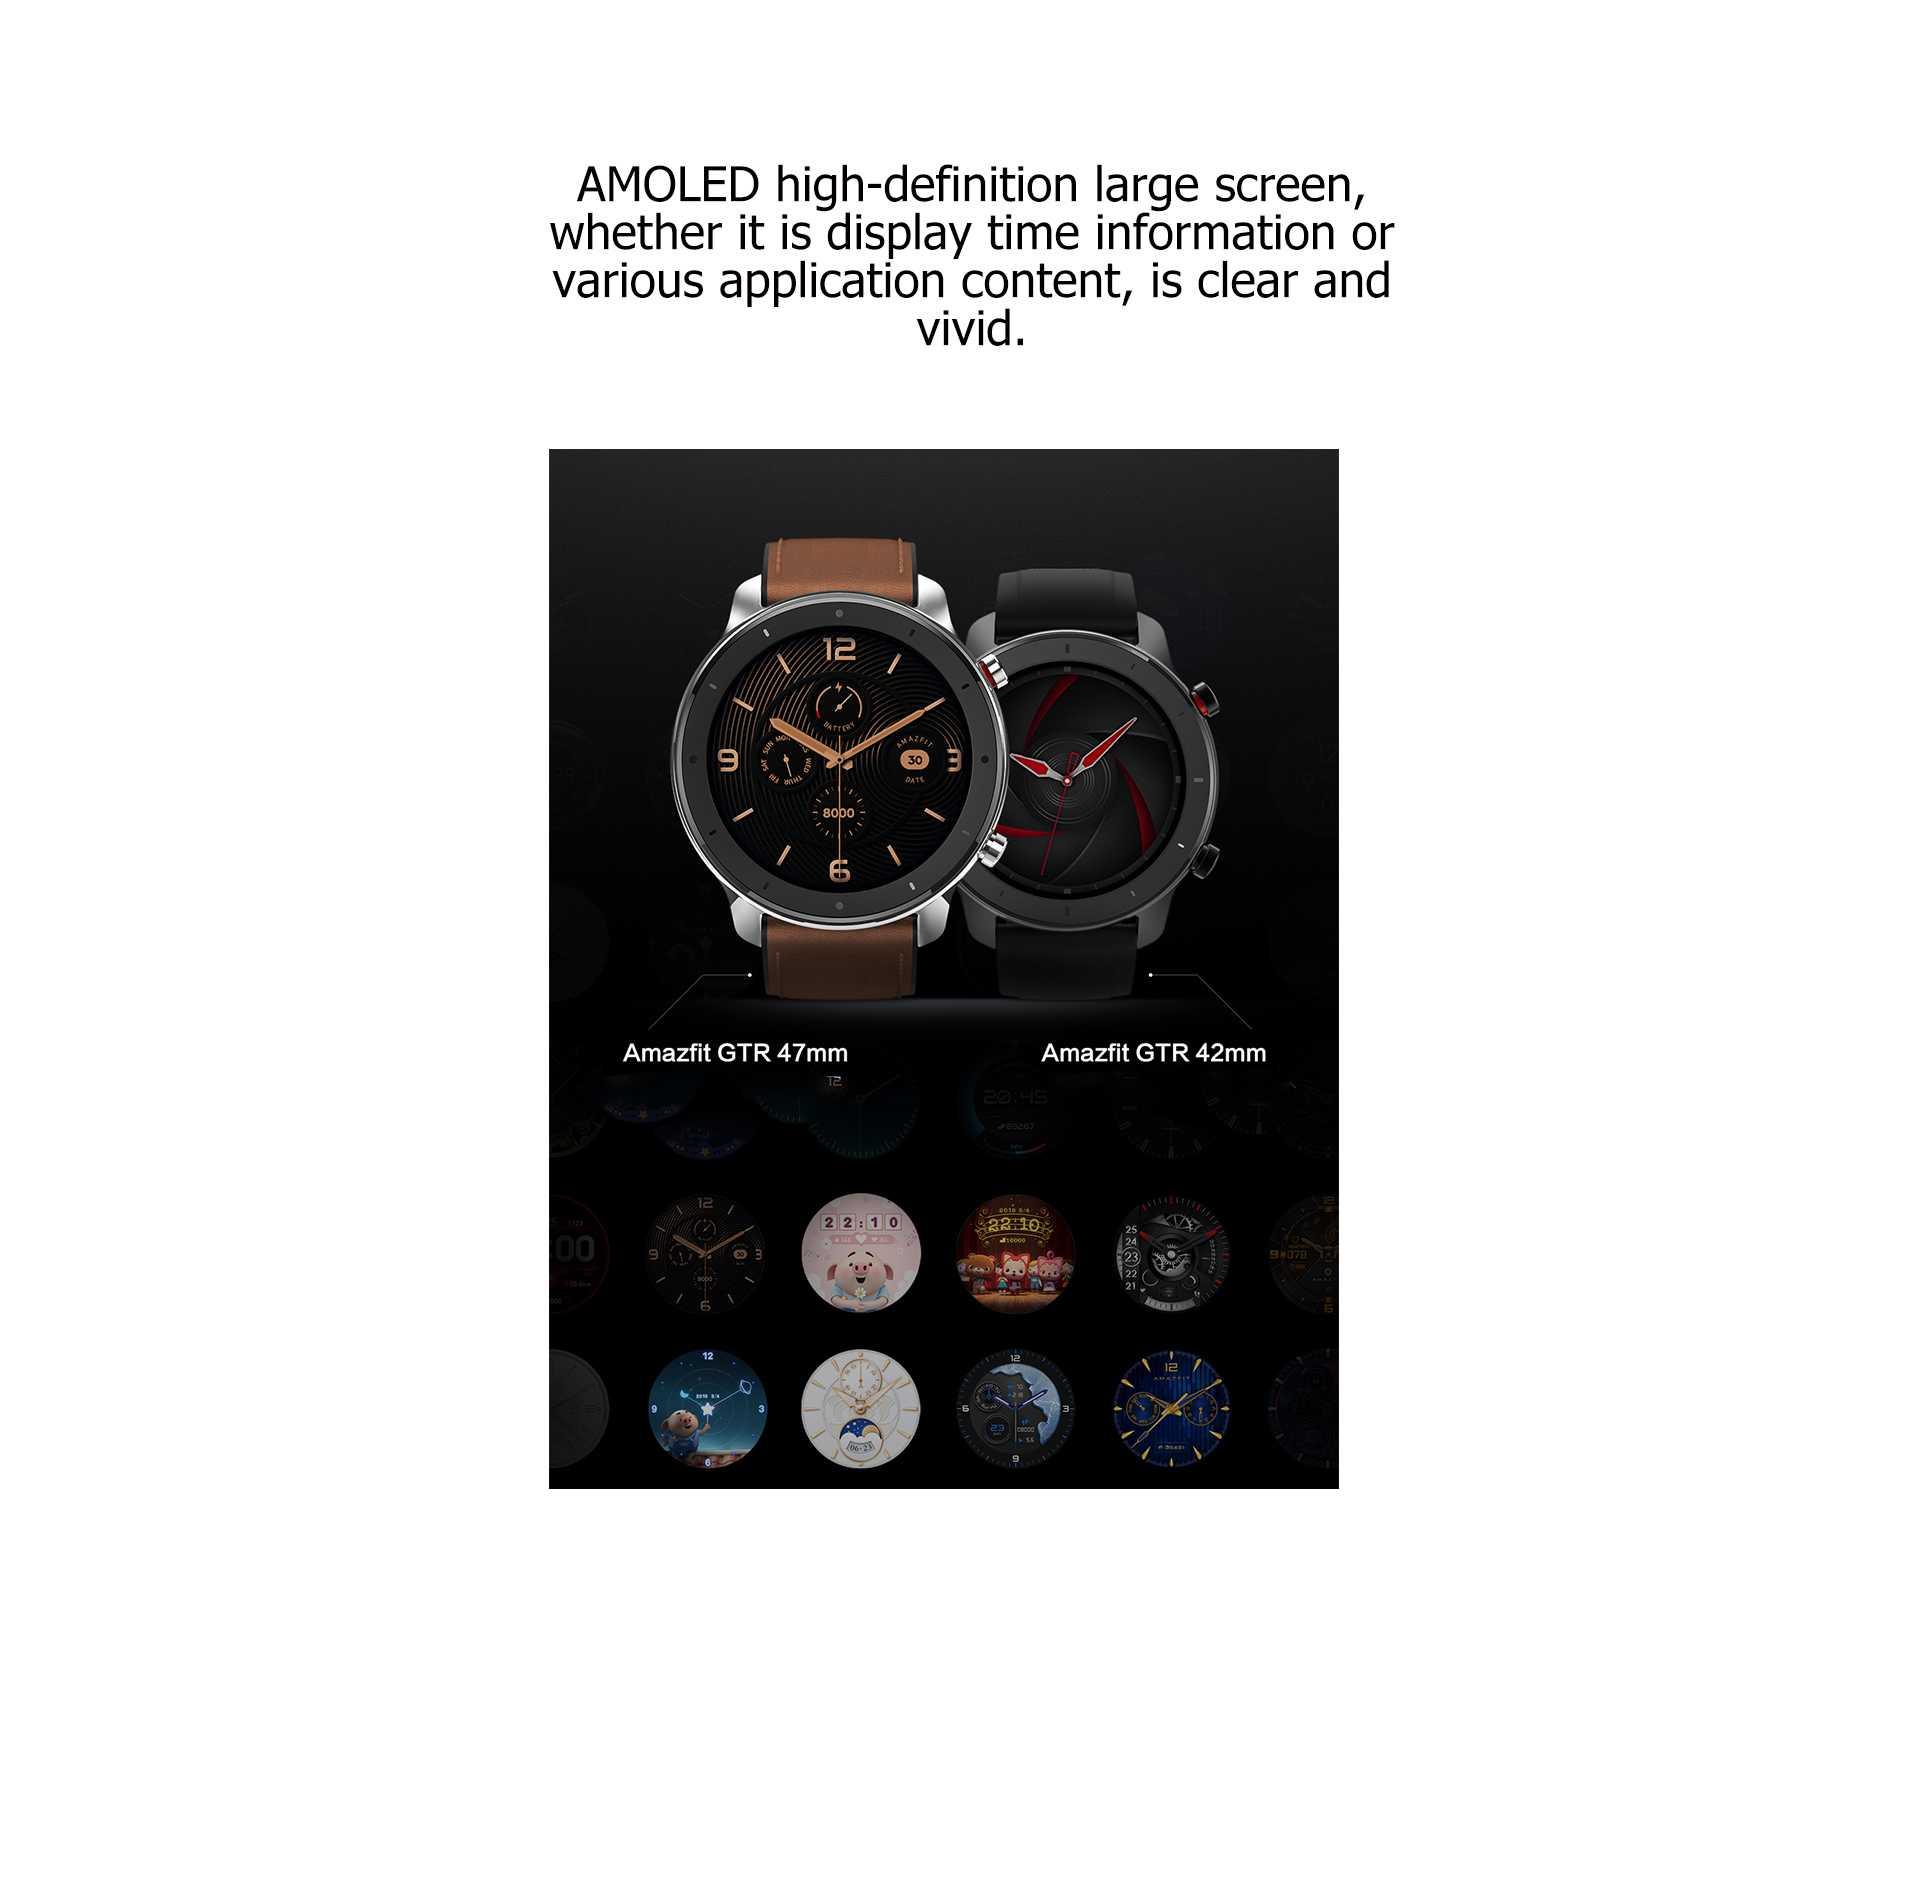 Amazfit GTR AMOLED Smart Watch GPS+GLONASS Wholesale